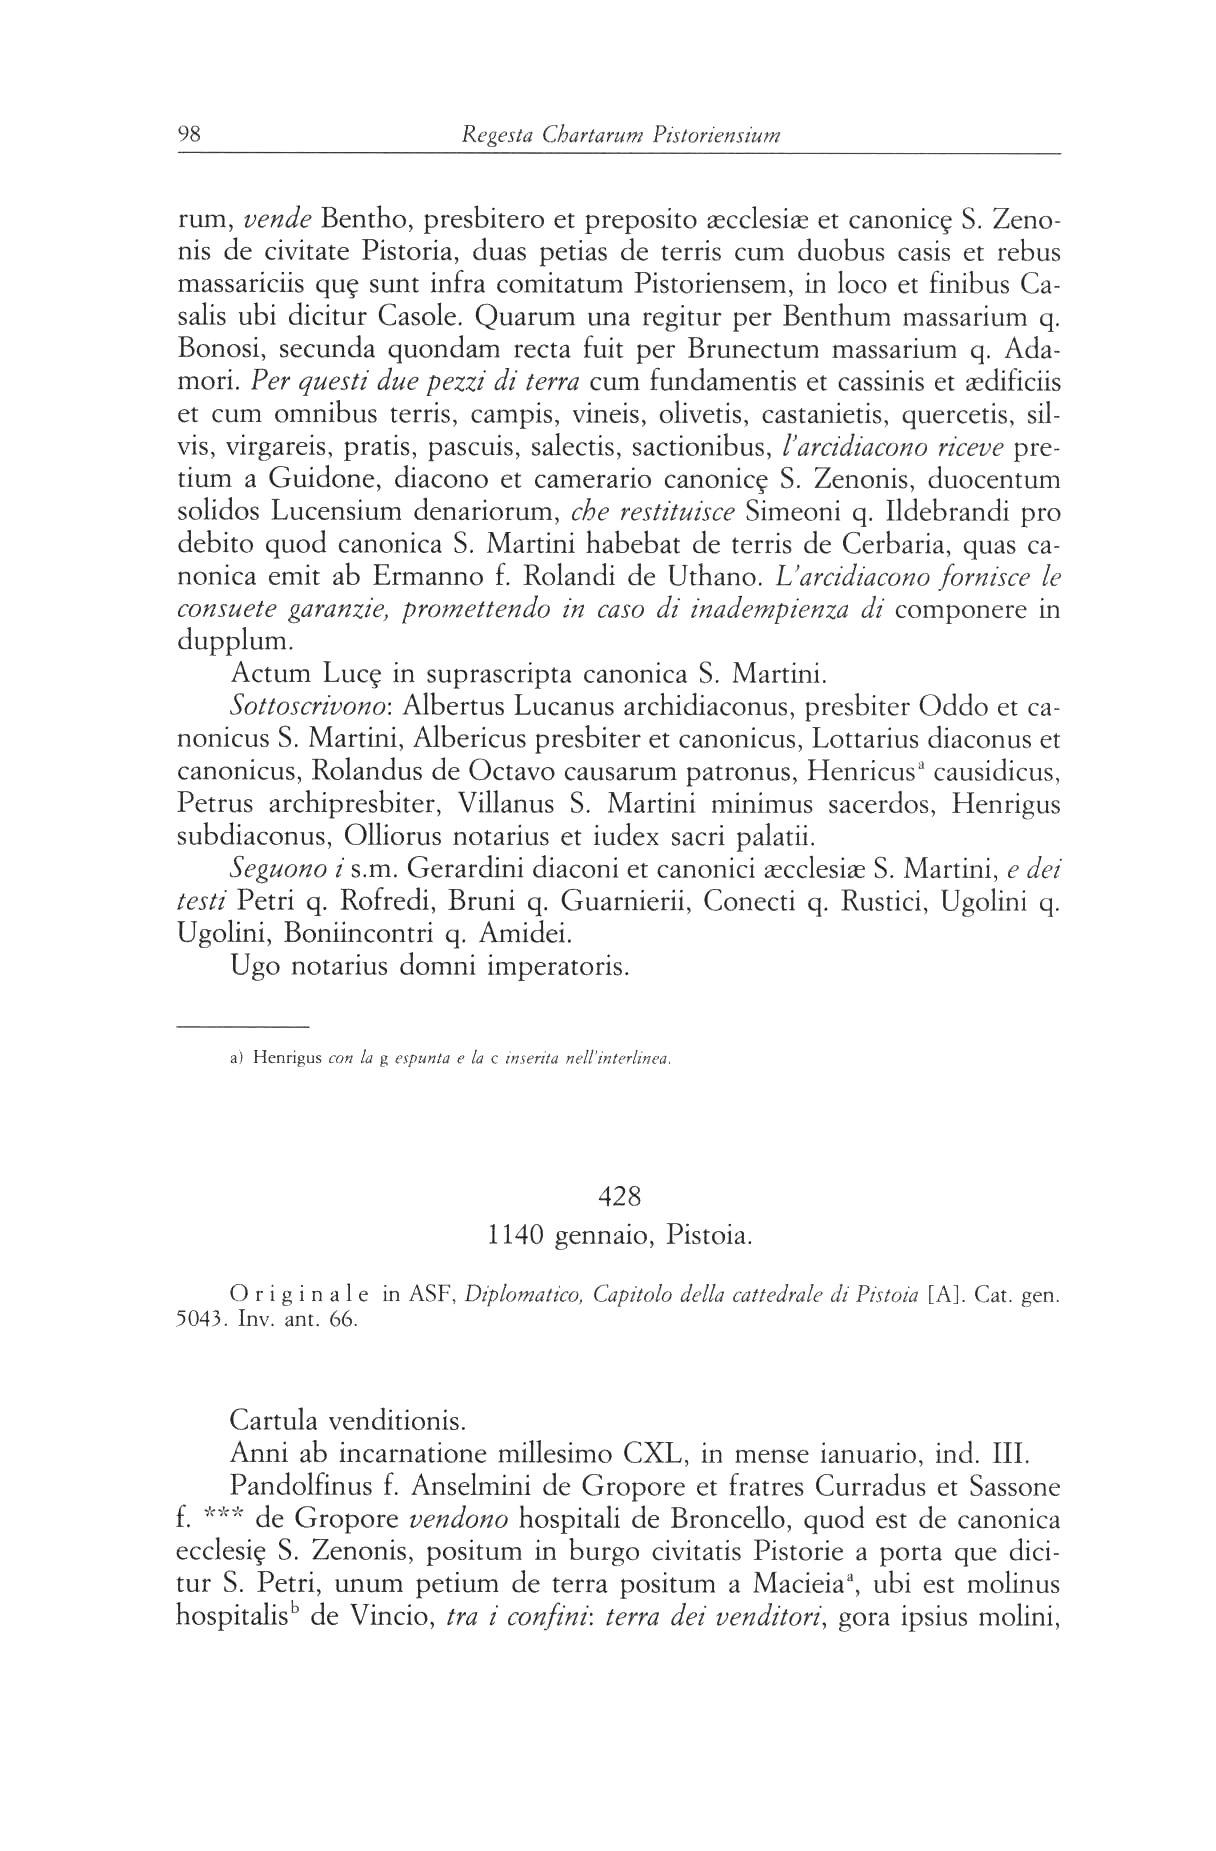 Canonica S. Zenone XII 0098.jpg